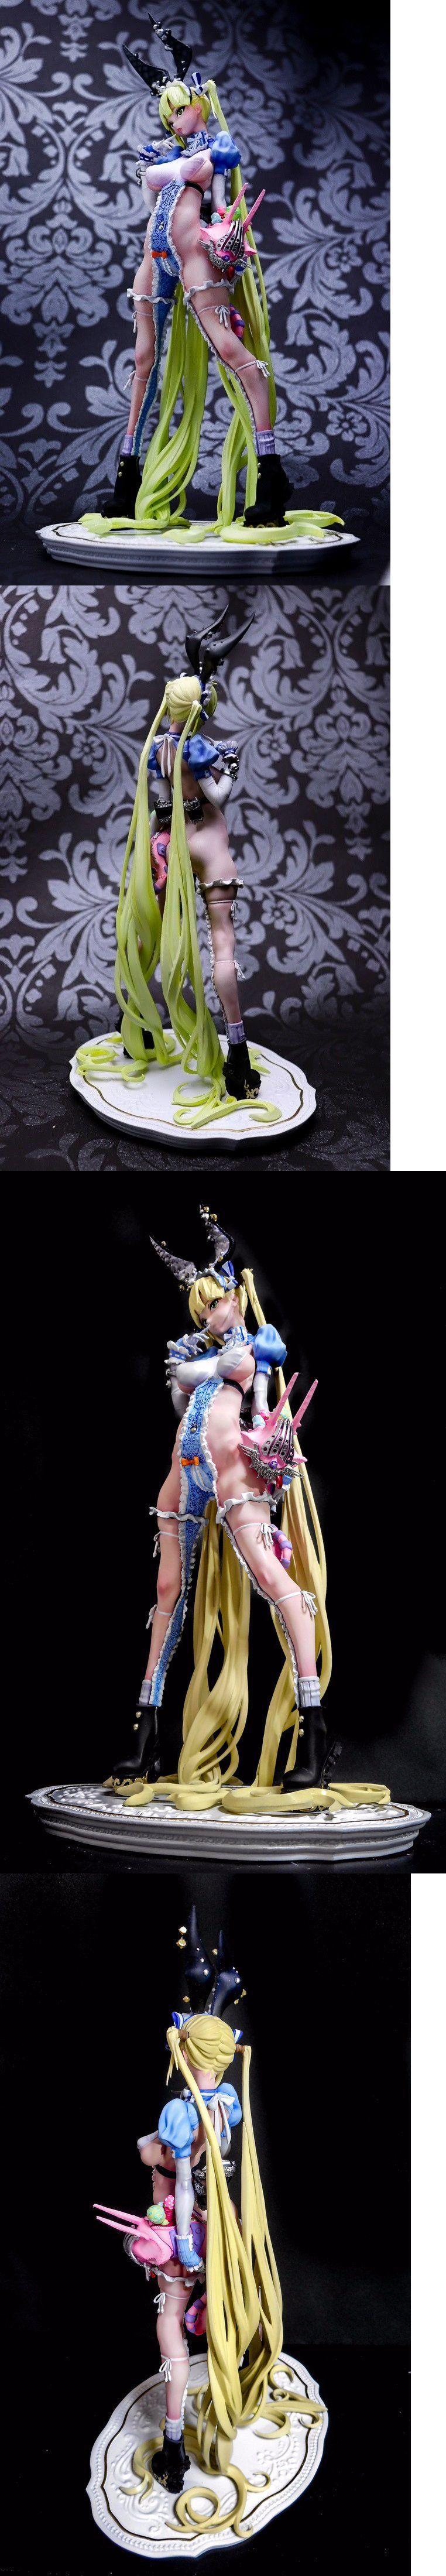 Anime 49210 w_27191 6 alice nighthawks unpainted resin